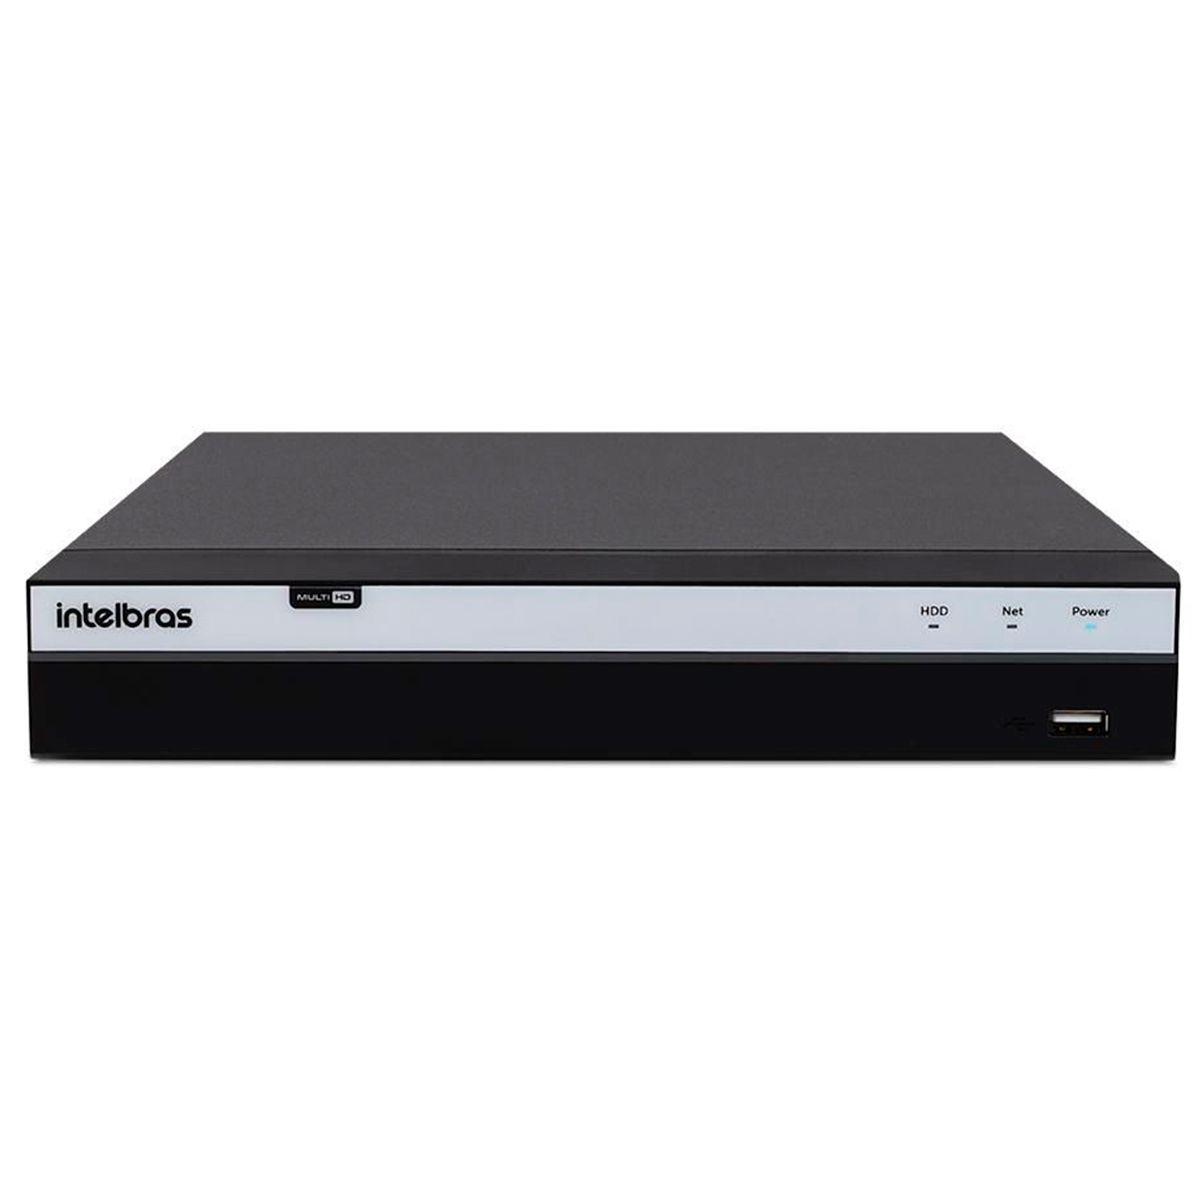 Kit 6 Câmeras de Segurança Full HD 1080p VHD 3230B G4 + DVR Intelbras Full HD + HD WD Purple 2TB + Acessórios  - Tudo Forte